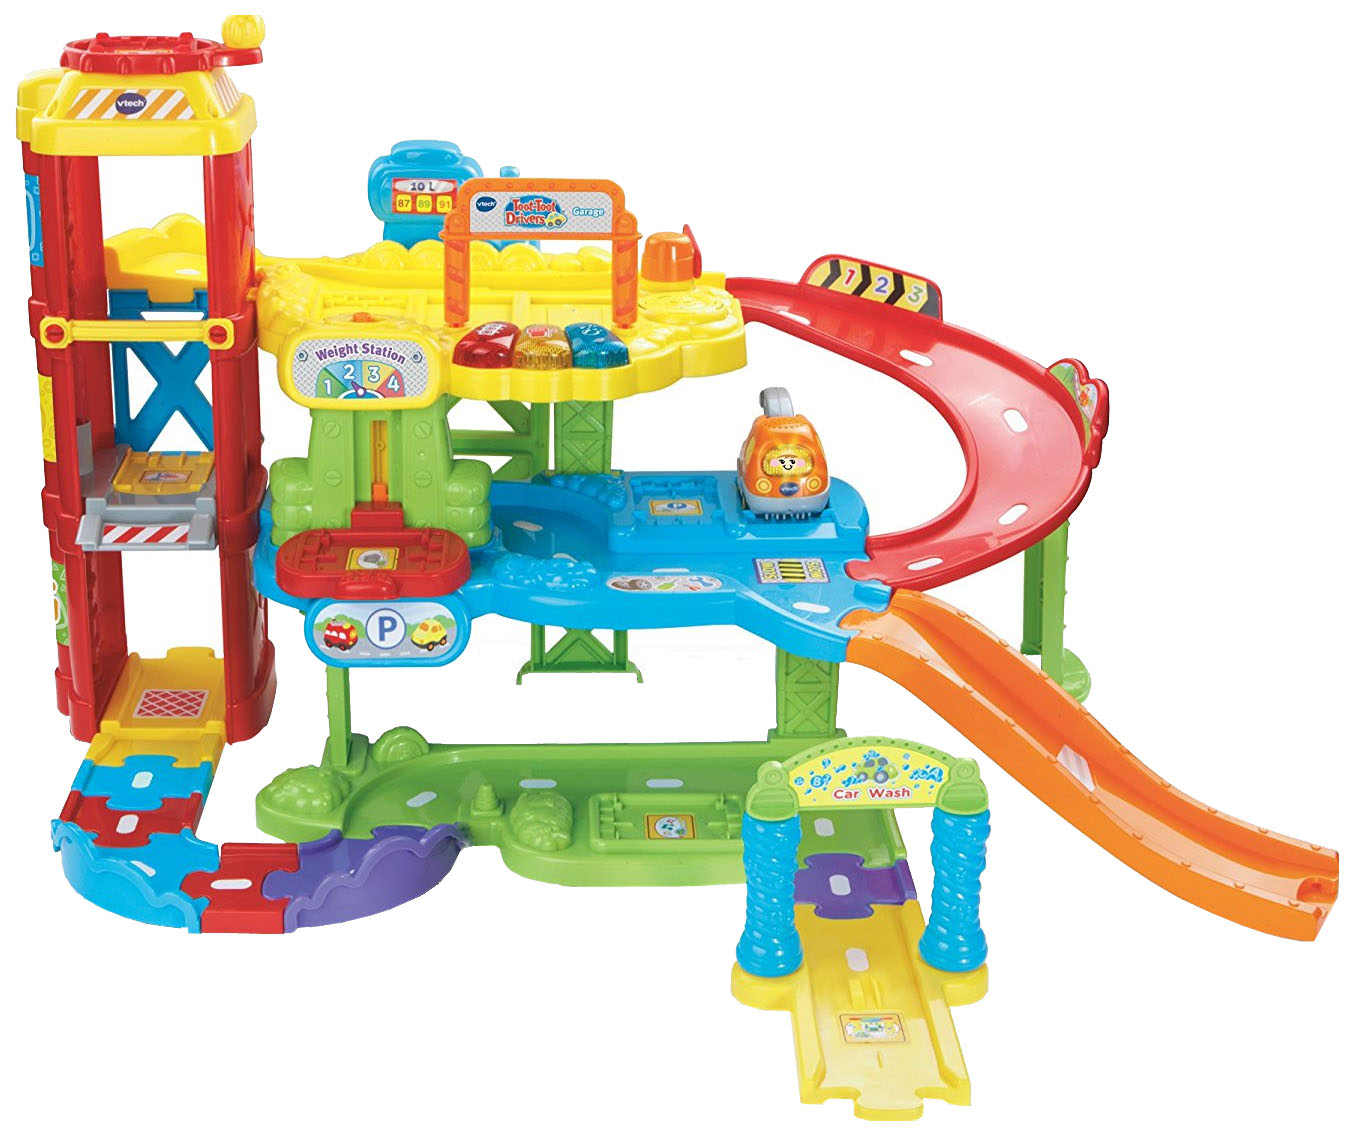 Гараж игрушечный VTech Бип-Бип 80-180026